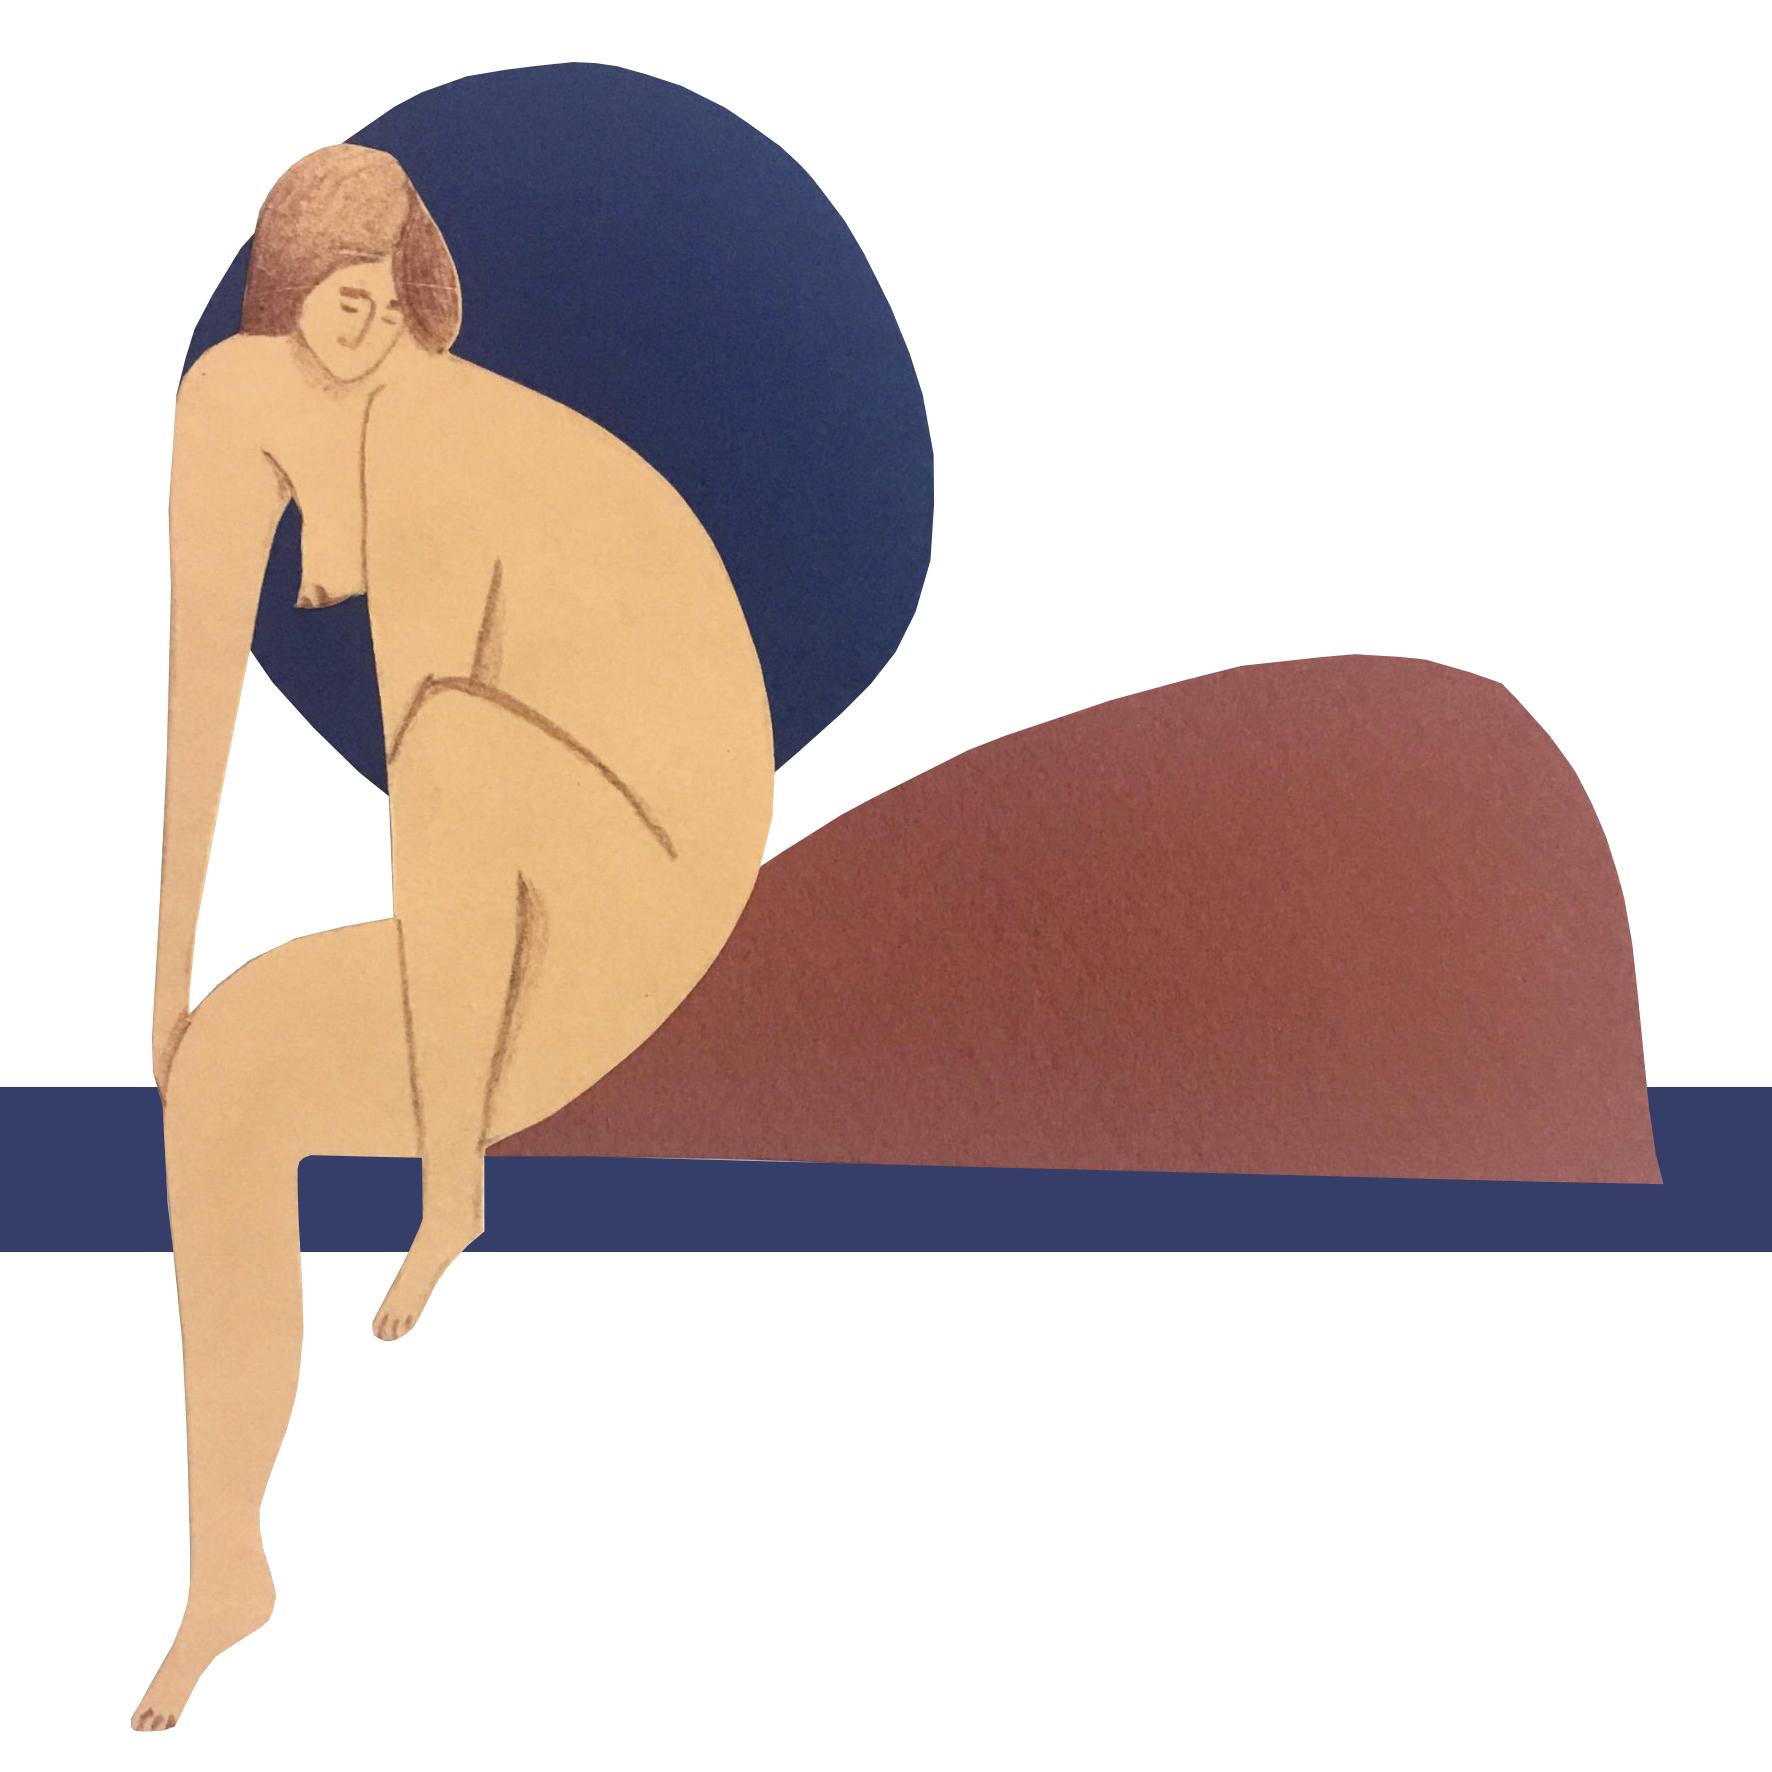 nudes 2